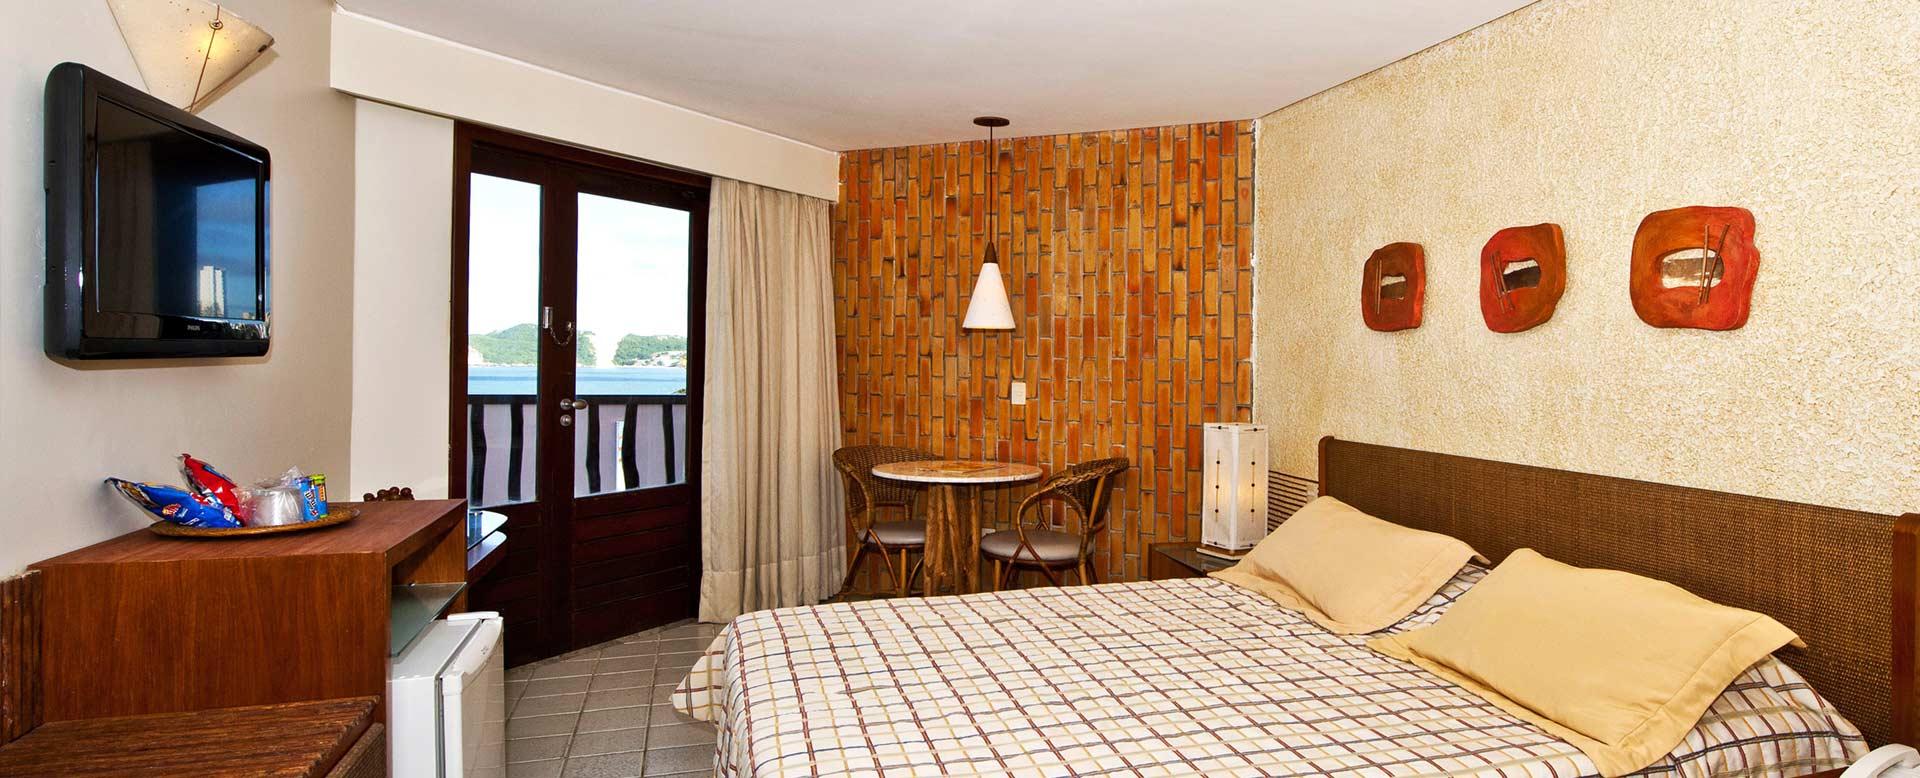 slider-page-rifoles-praia-hotel-e-resort-acomodacoes